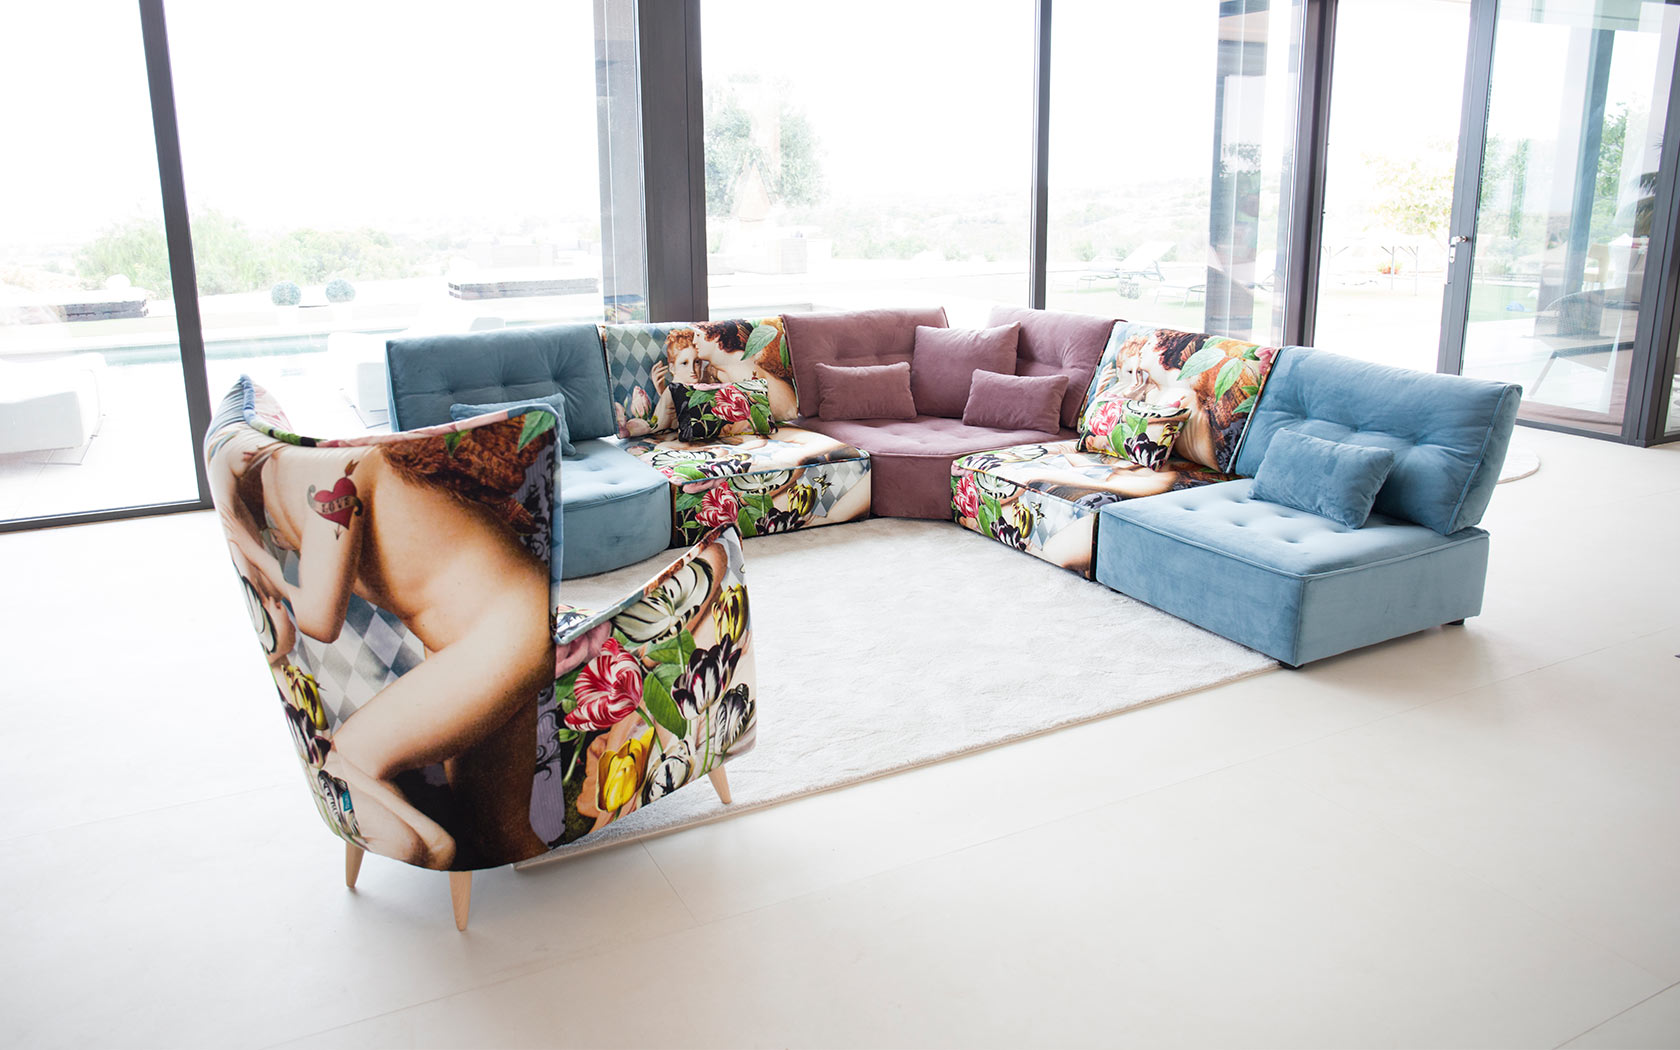 100 Fantastique Concepts Fama Arianne Love Sofa